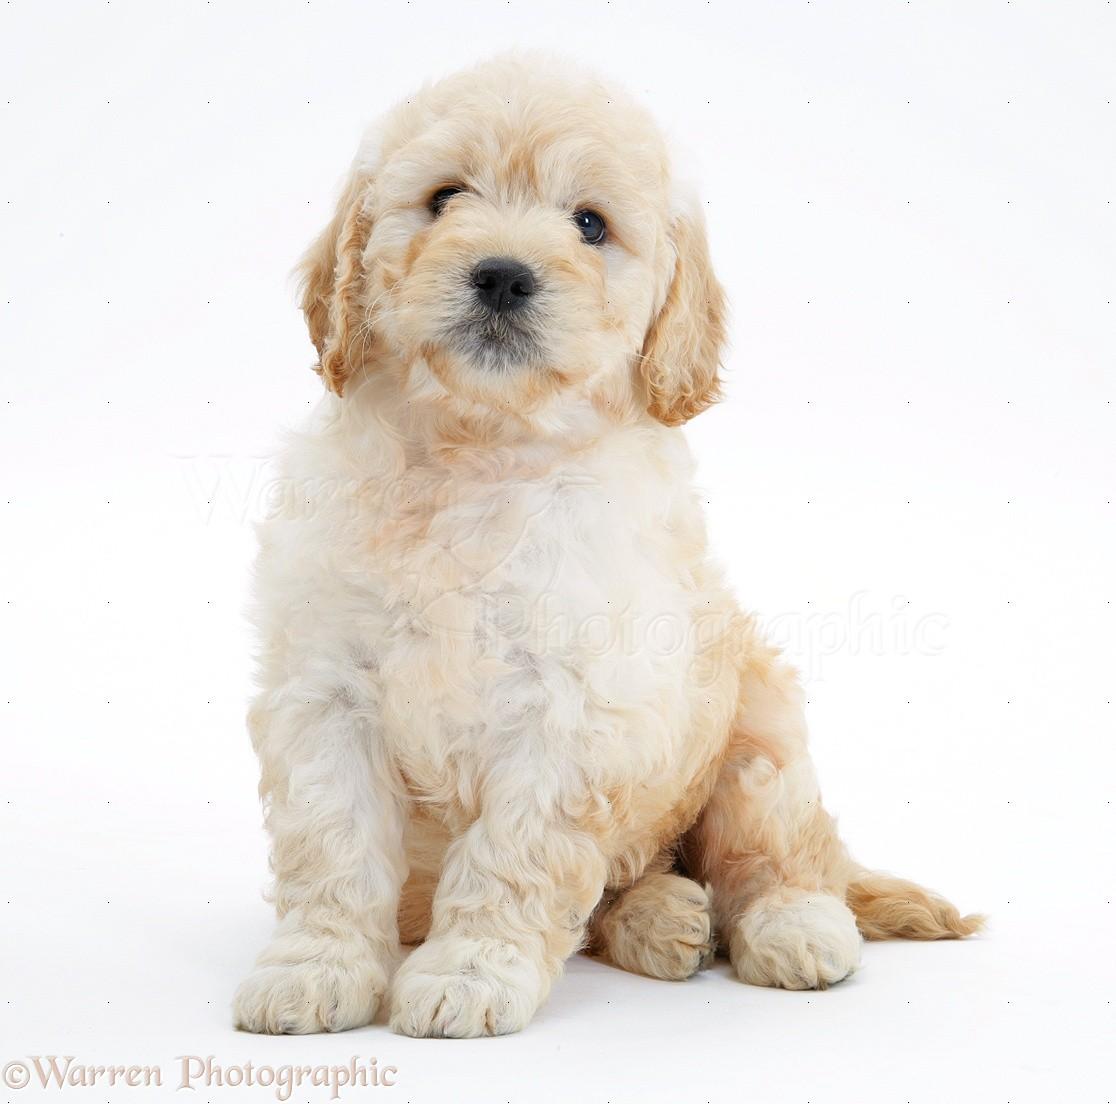 Dog Miniature Goldendoodle Pup 7 Weeks Old Sitting Photo Wp25403